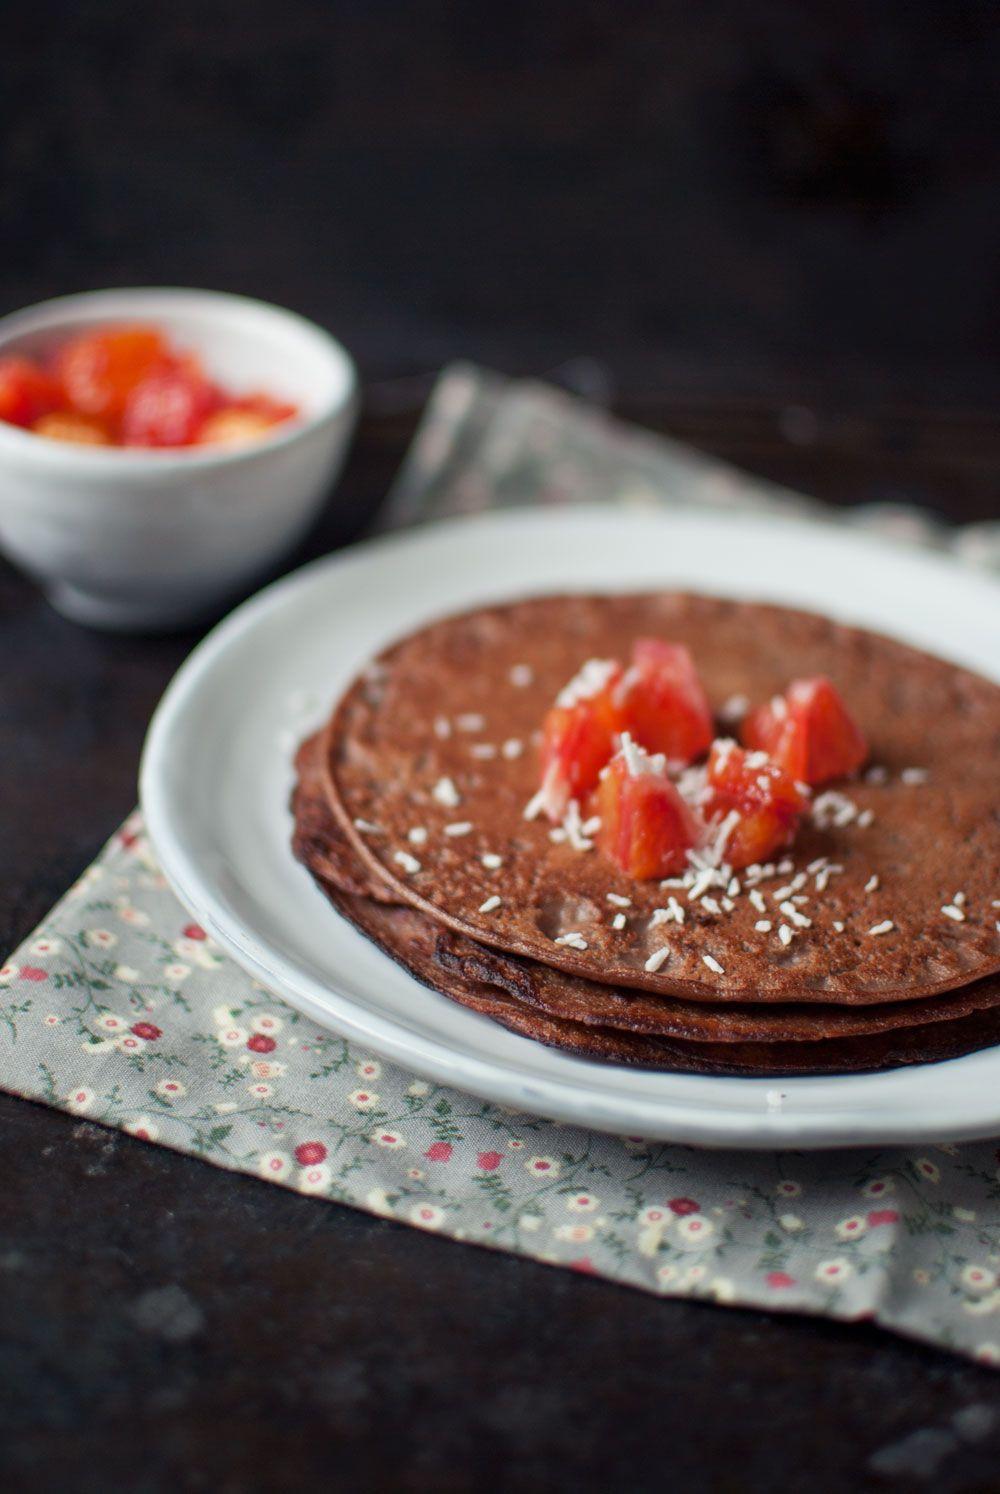 Pandekager Med Chokolade Nem Og Laekker Opskrift Chokolade Mad Ideer Dessert